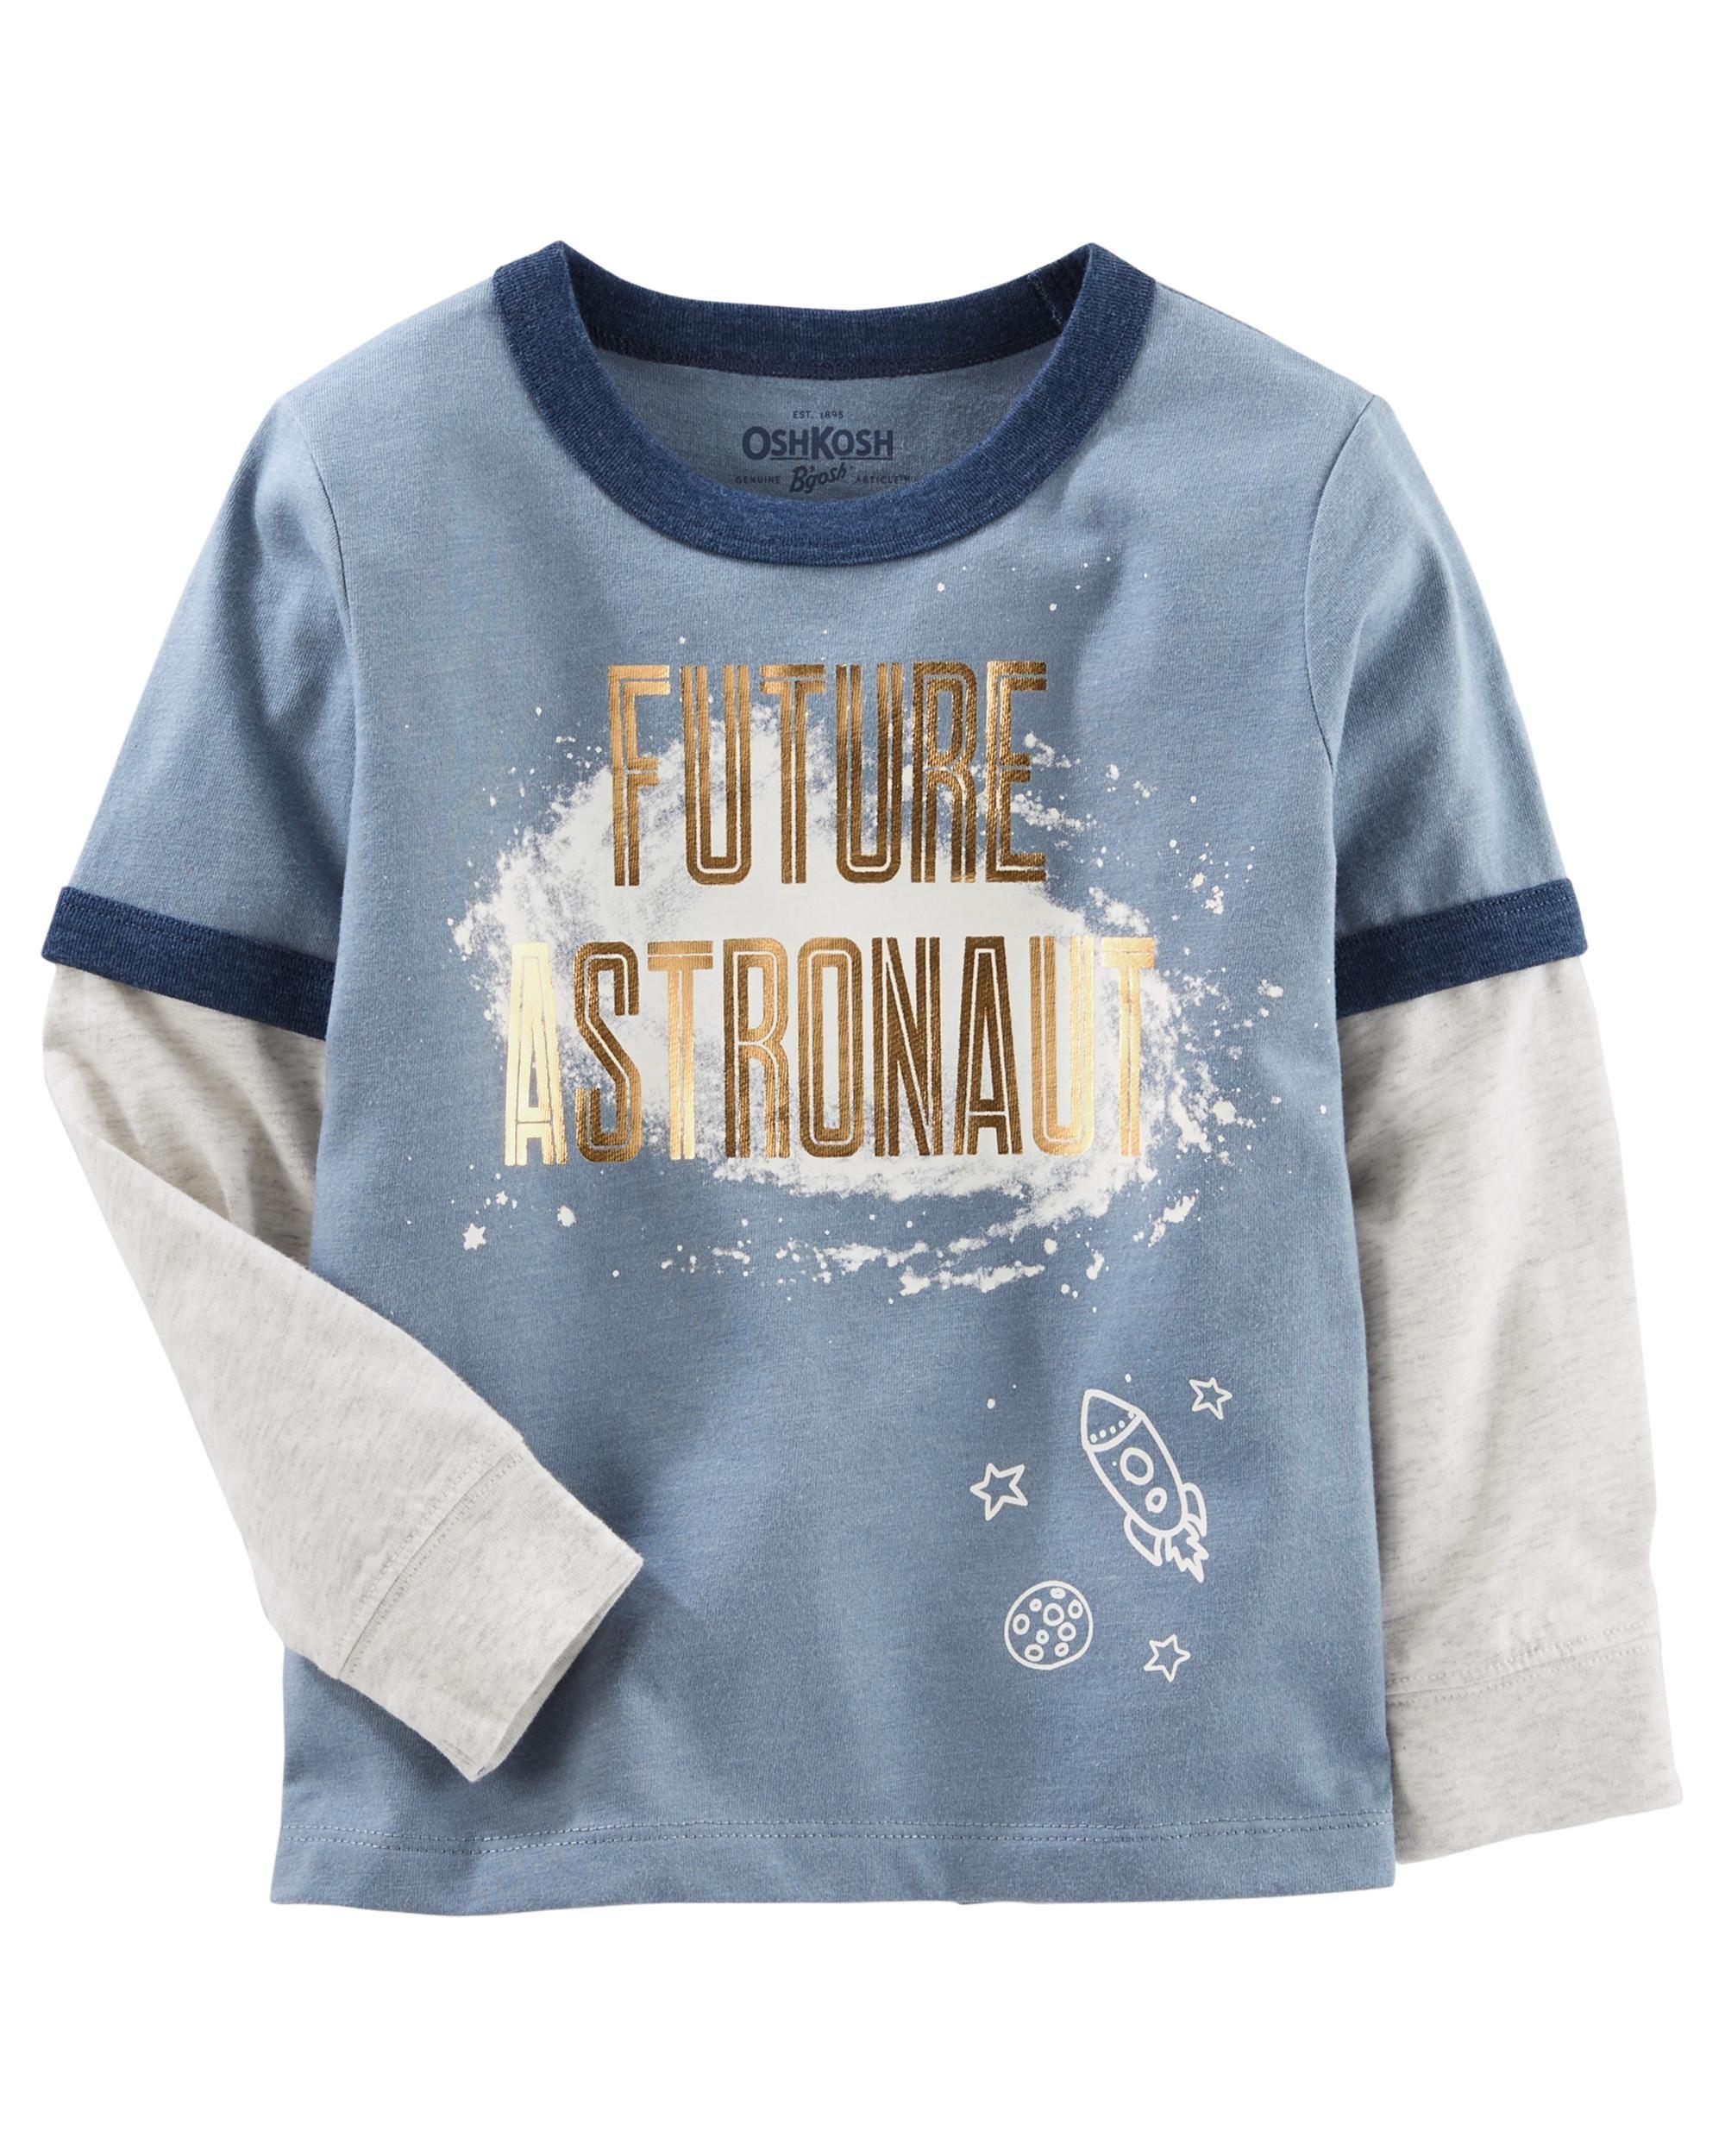 3f5e90cbfdd Toddler Boy Layered-Look Graphic Tee